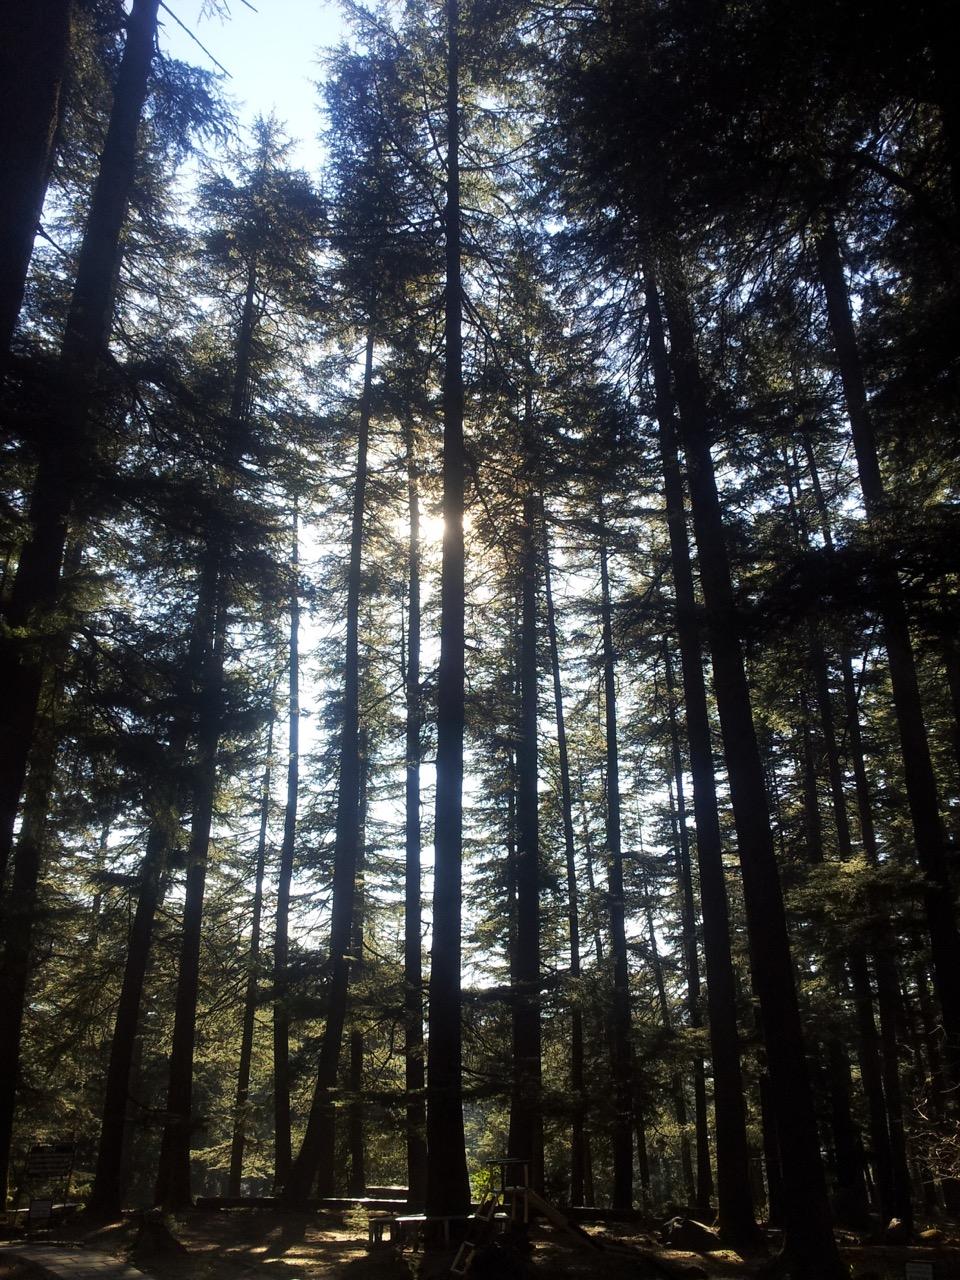 Pine (Deodar) trees inside Van Vihar.